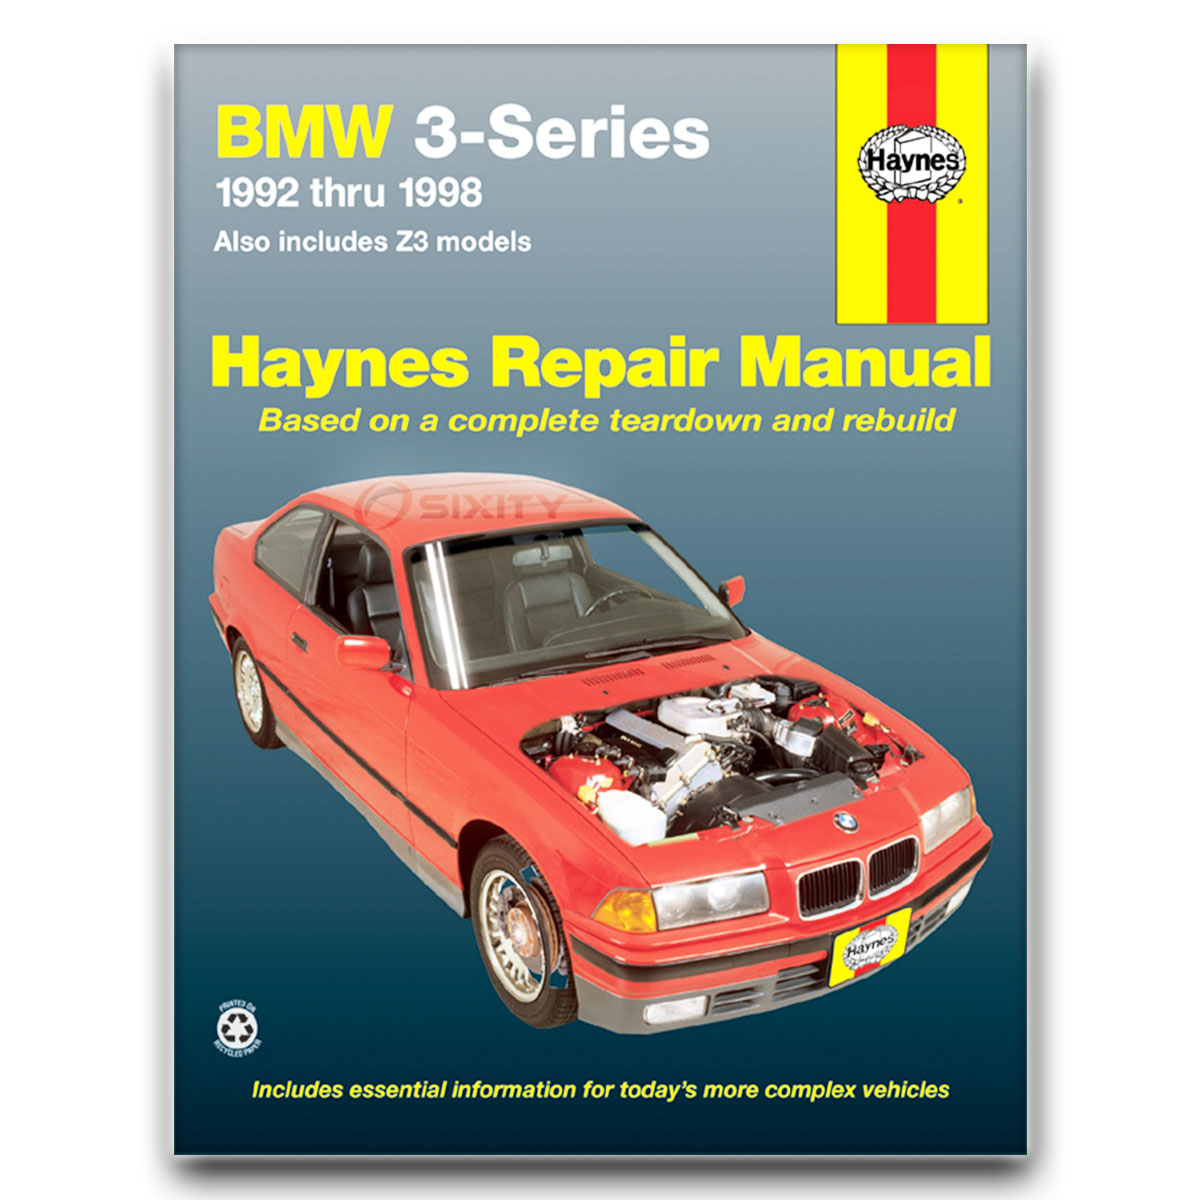 Haynes Repair Manual 18021 for BMW 3-Series Including Z3 92-98 Shop Service  ne